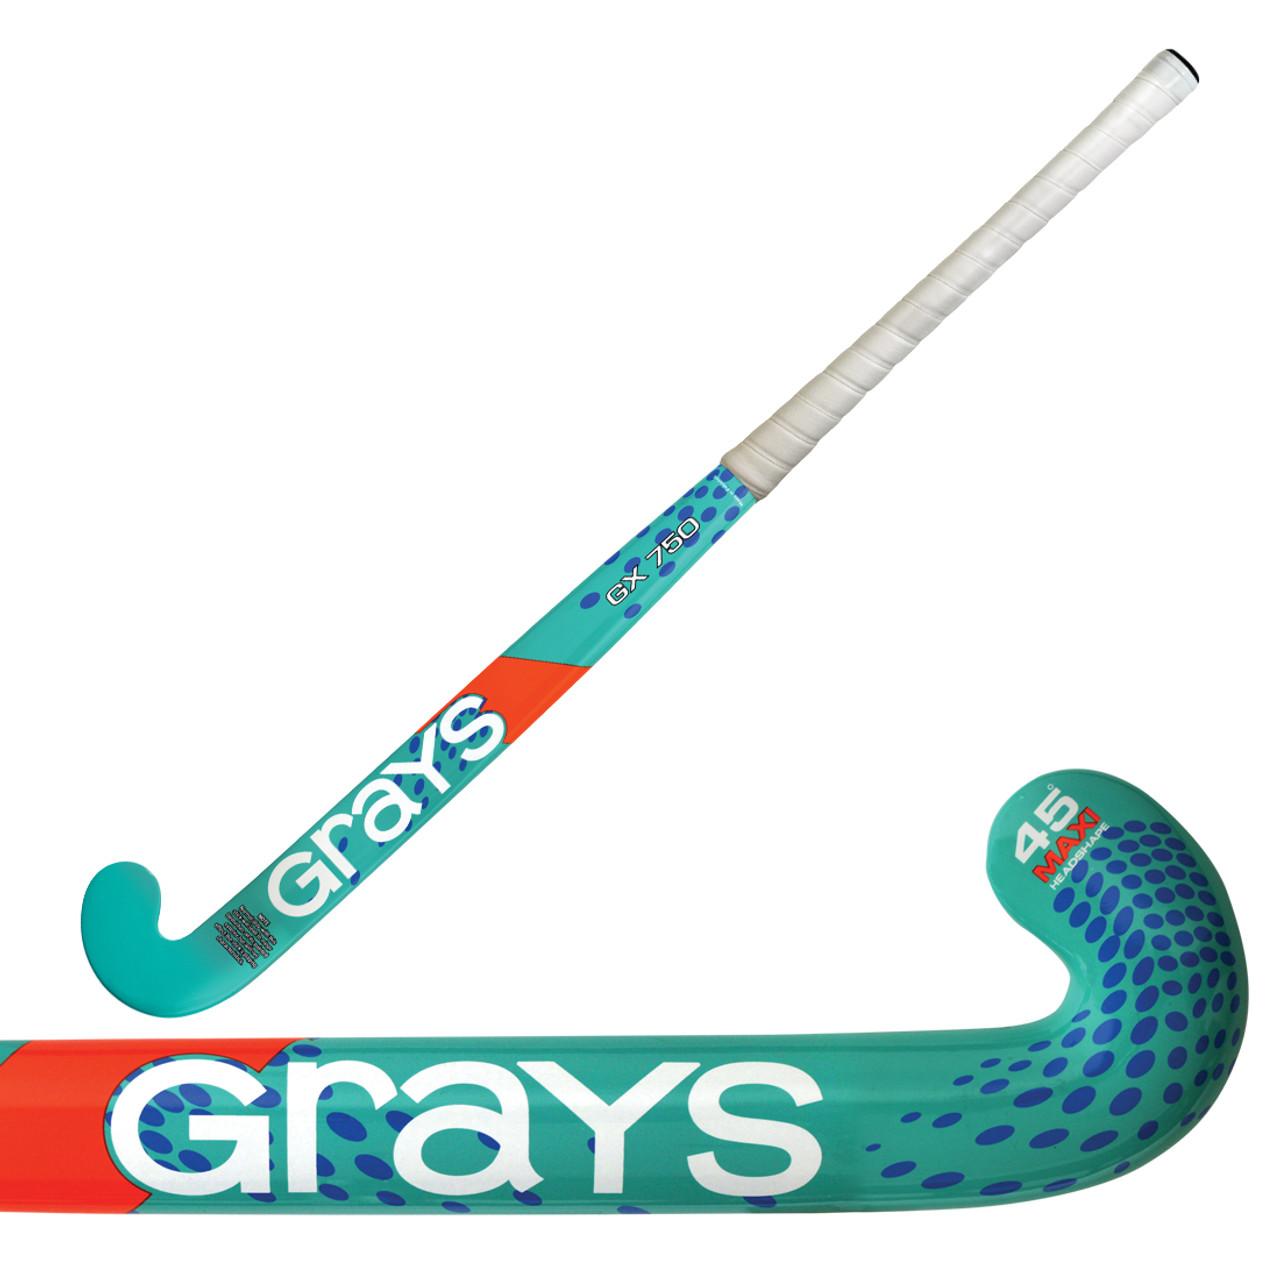 Grays GX750 Composite Field Hockey Stick